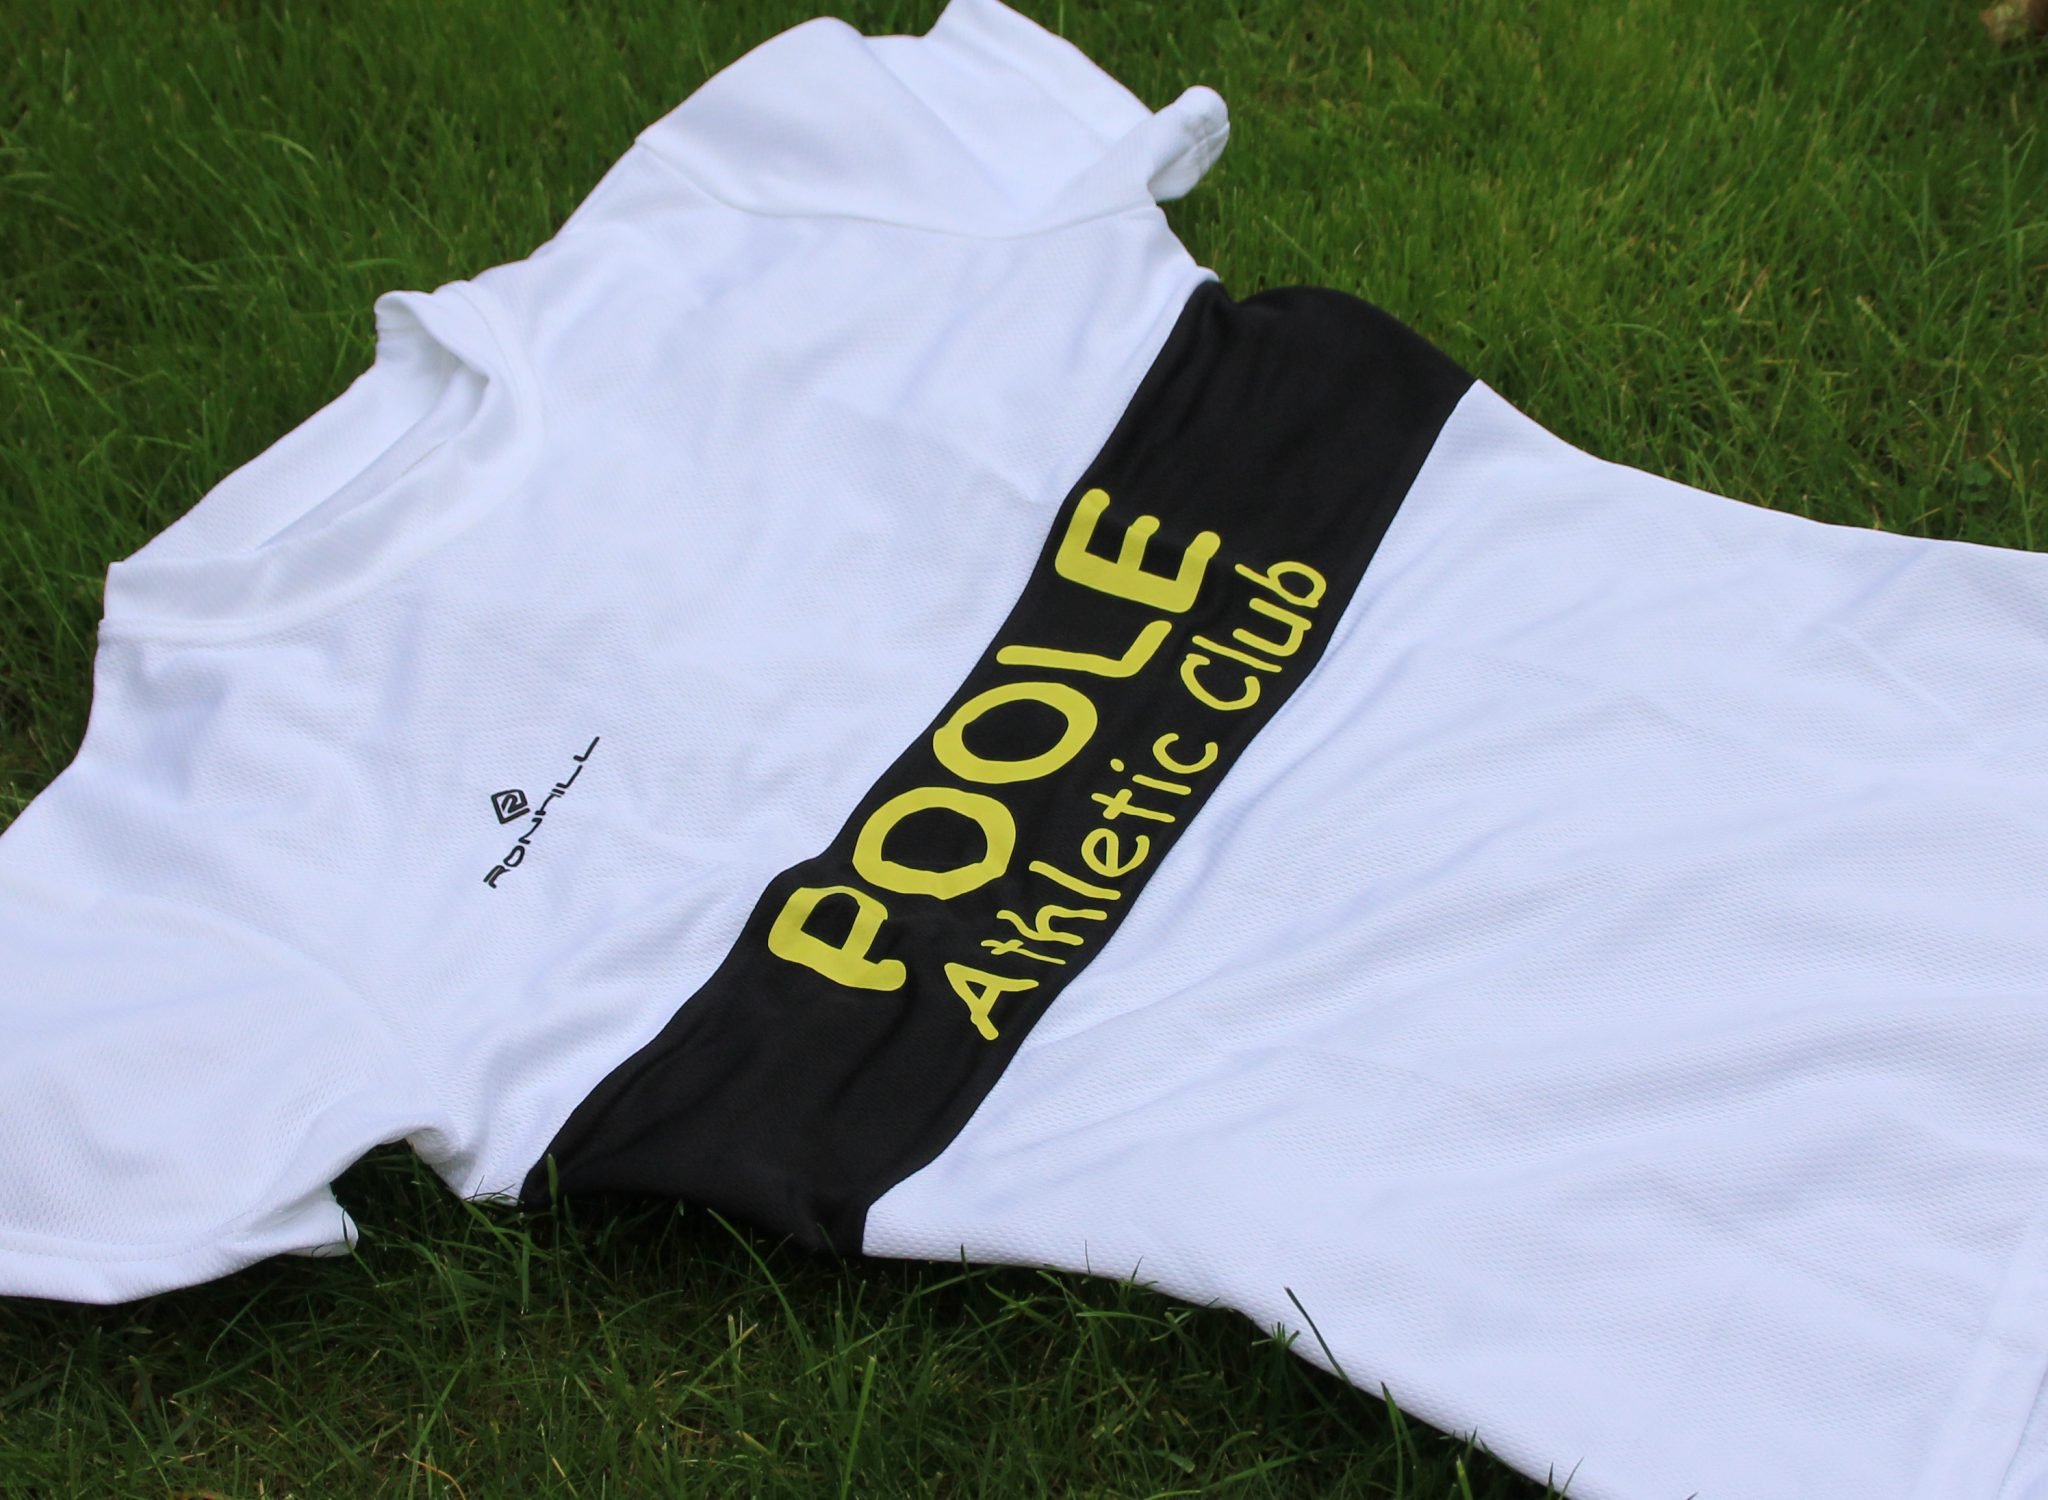 Poole AC road running t shirt